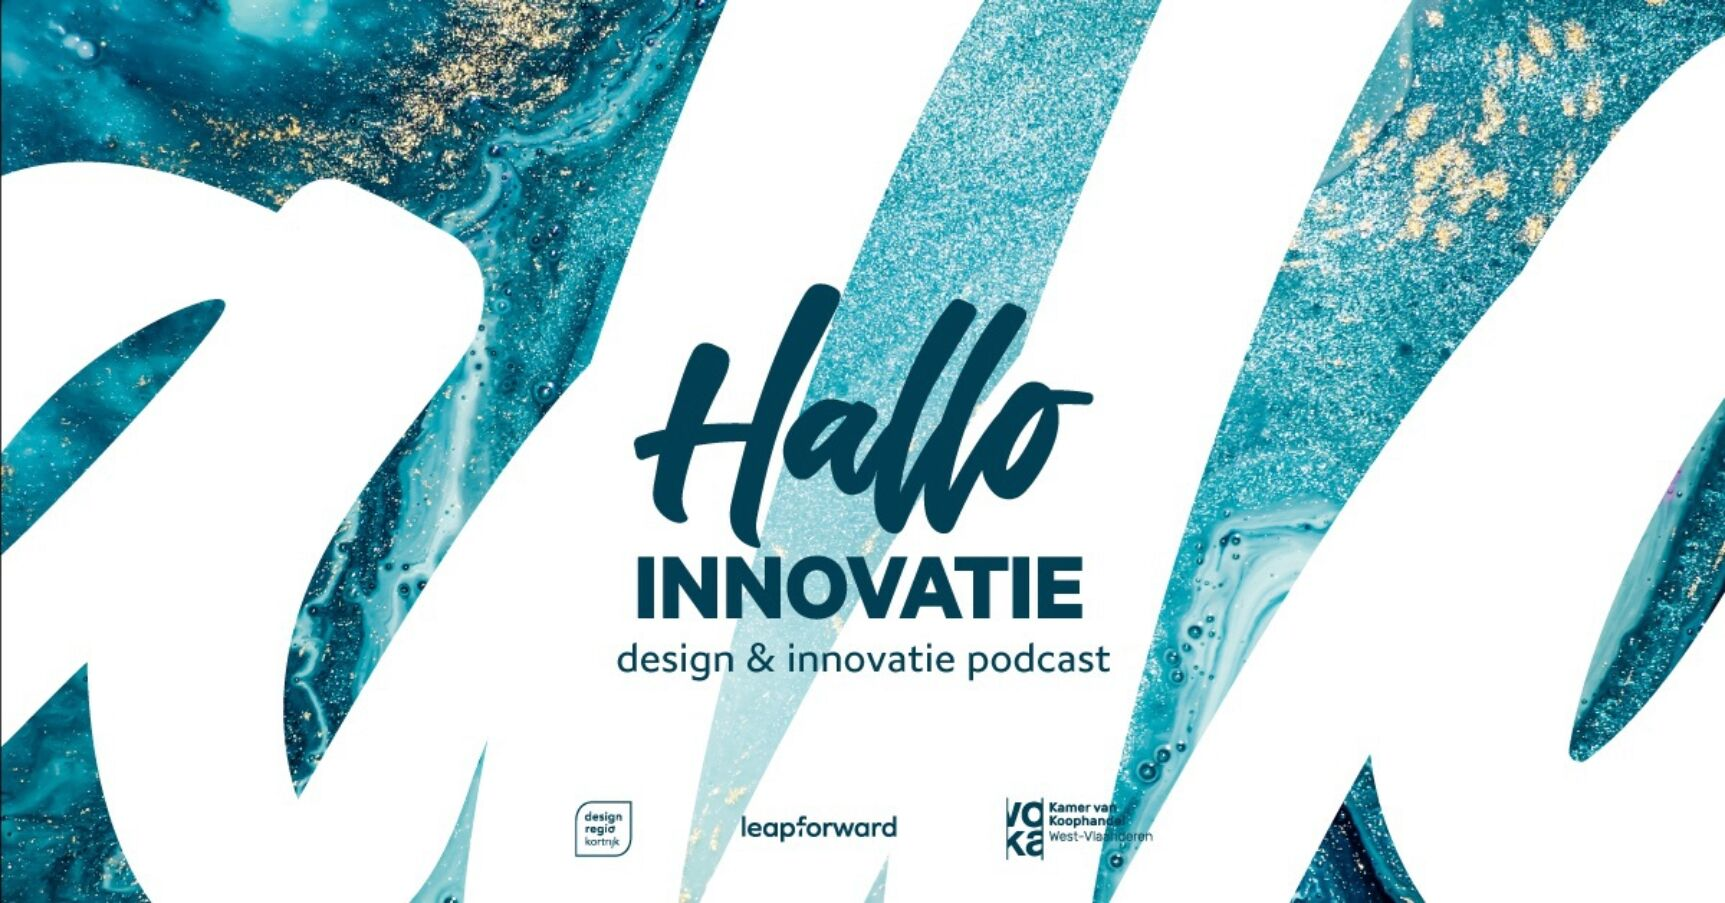 Hallo innovatie